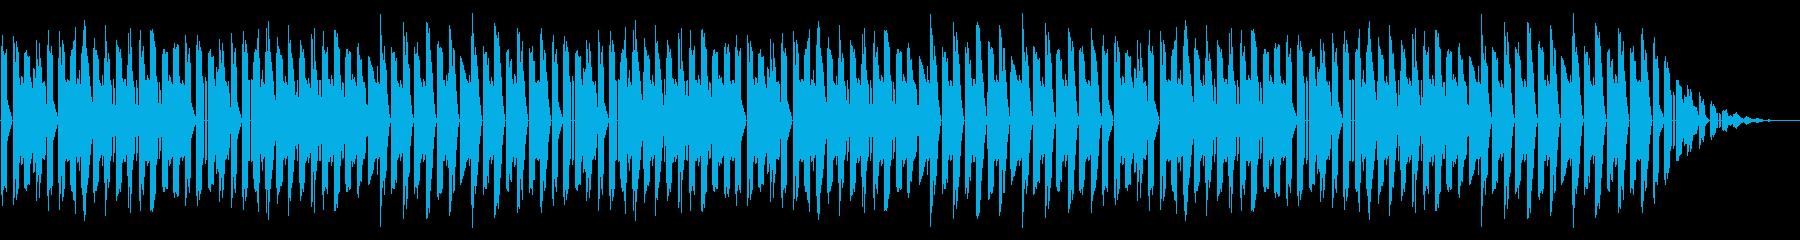 GB系風和風ゲームのステージ曲の再生済みの波形